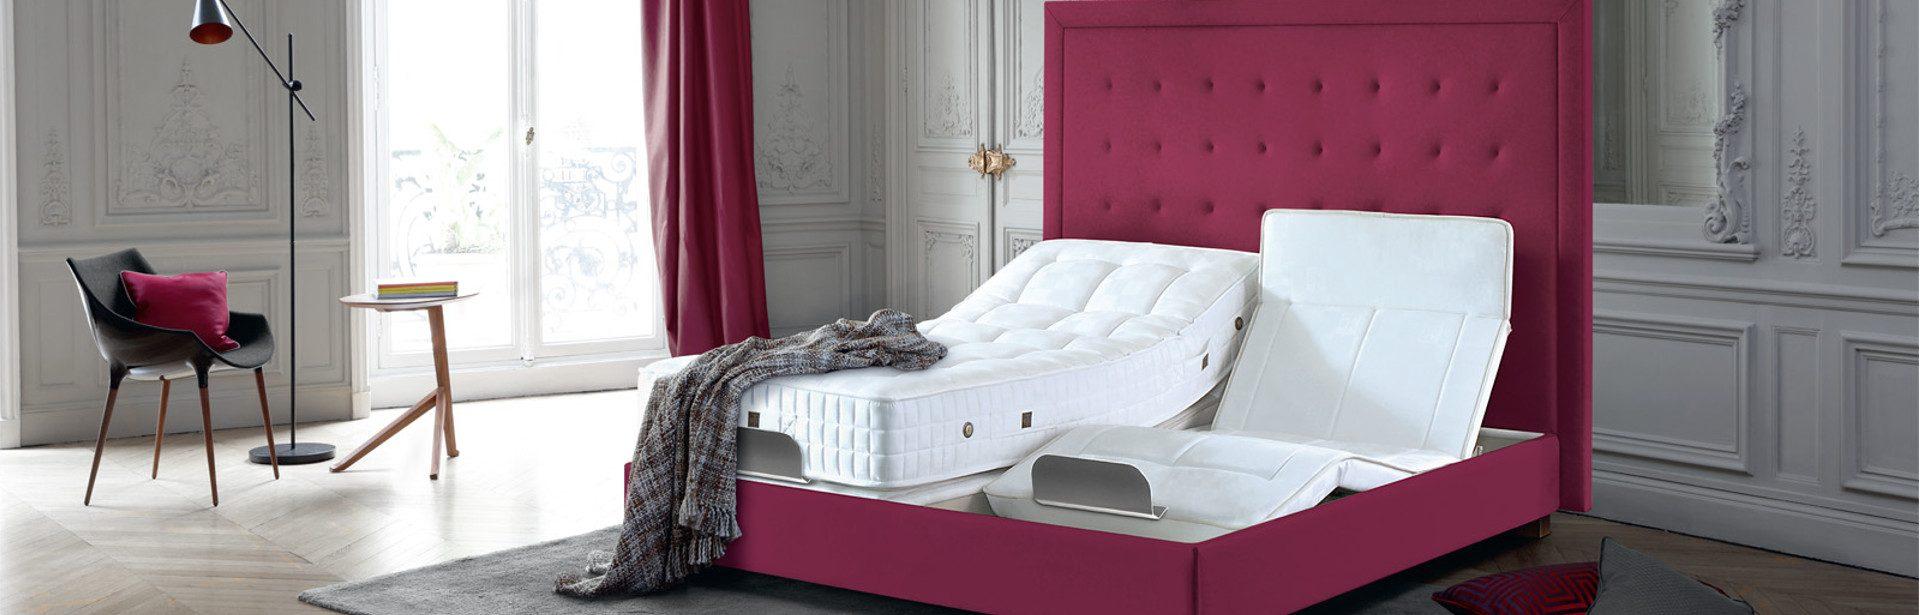 Full Size of Treca Betten Interiors Paris Massivholz Billerbeck Breckle Ikea 160x200 Bock 90x200 Rauch Musterring 140x200 Dico Team 7 Holz Außergewöhnliche Günstige Bett Treca Betten